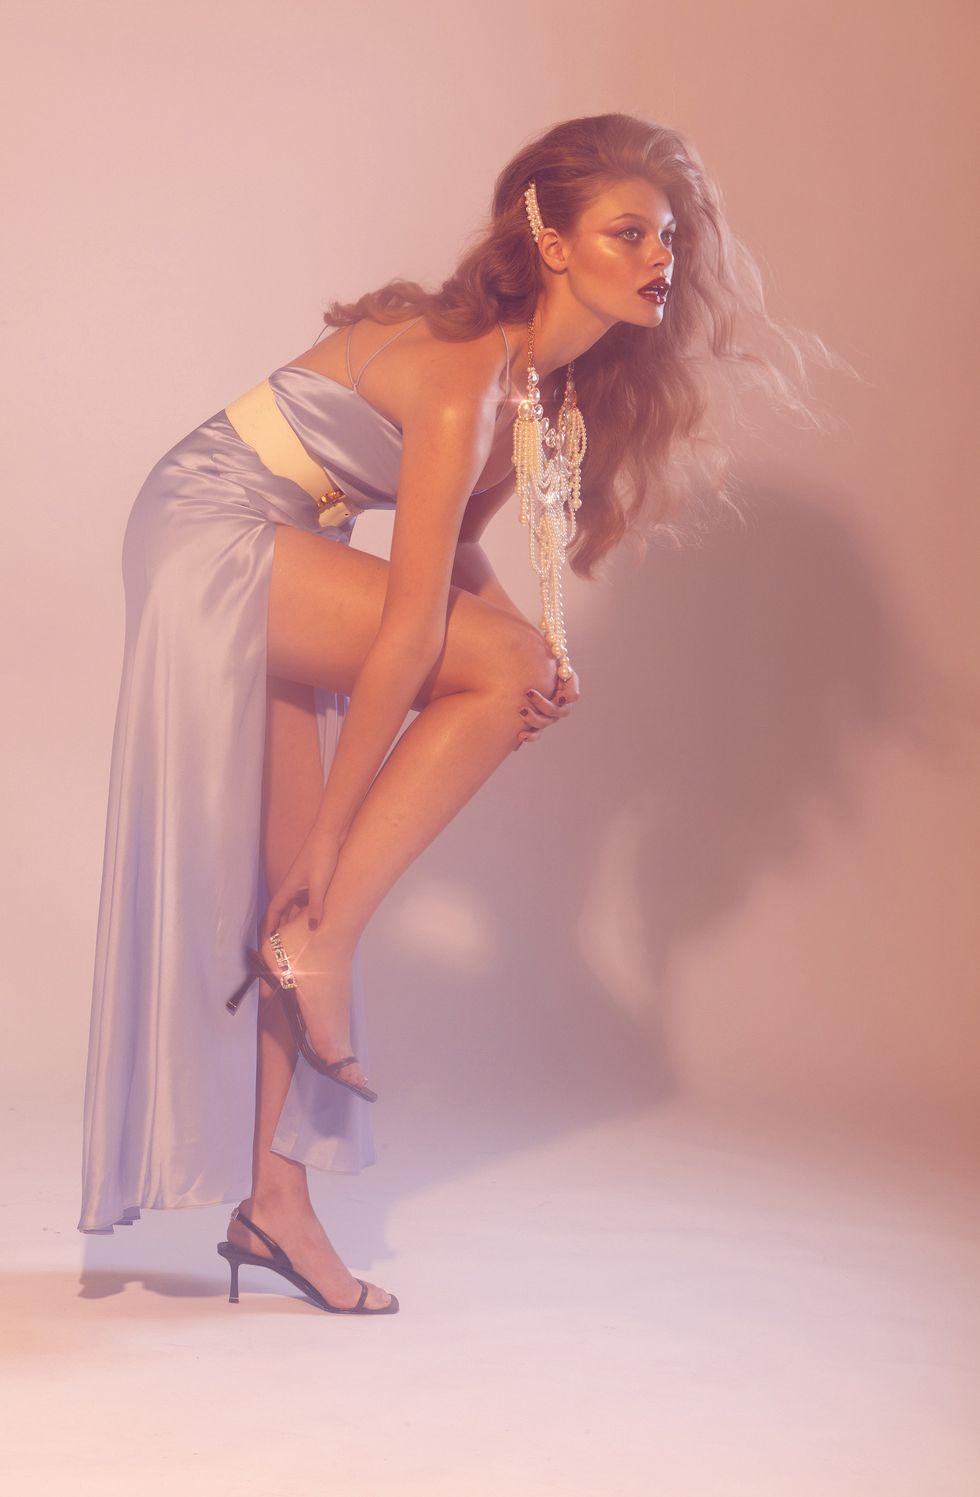 Vestido de Michelle Mason. Sandalias de Alexander Wang. Cintur\u00f3n vintage de Celine. Collar vintage YSL de Yves Saint Laurent. Broche de perlas vintage Edelweiss de Chanel.